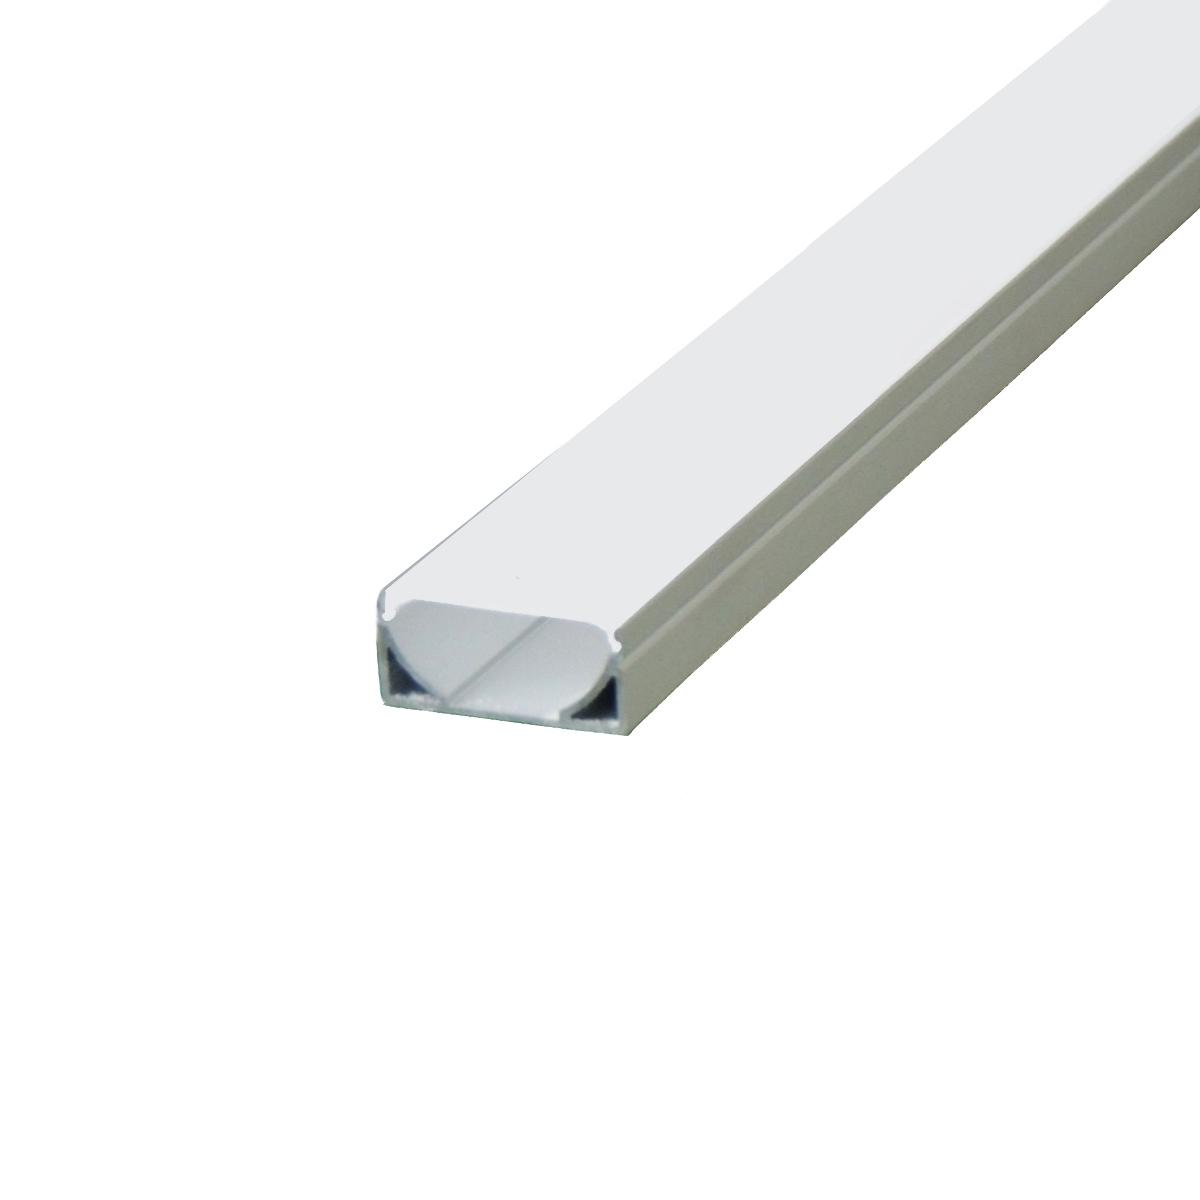 PERFIL SOBREPOR 27MM 2 METROS DIVERSAS CORES - i9 LED